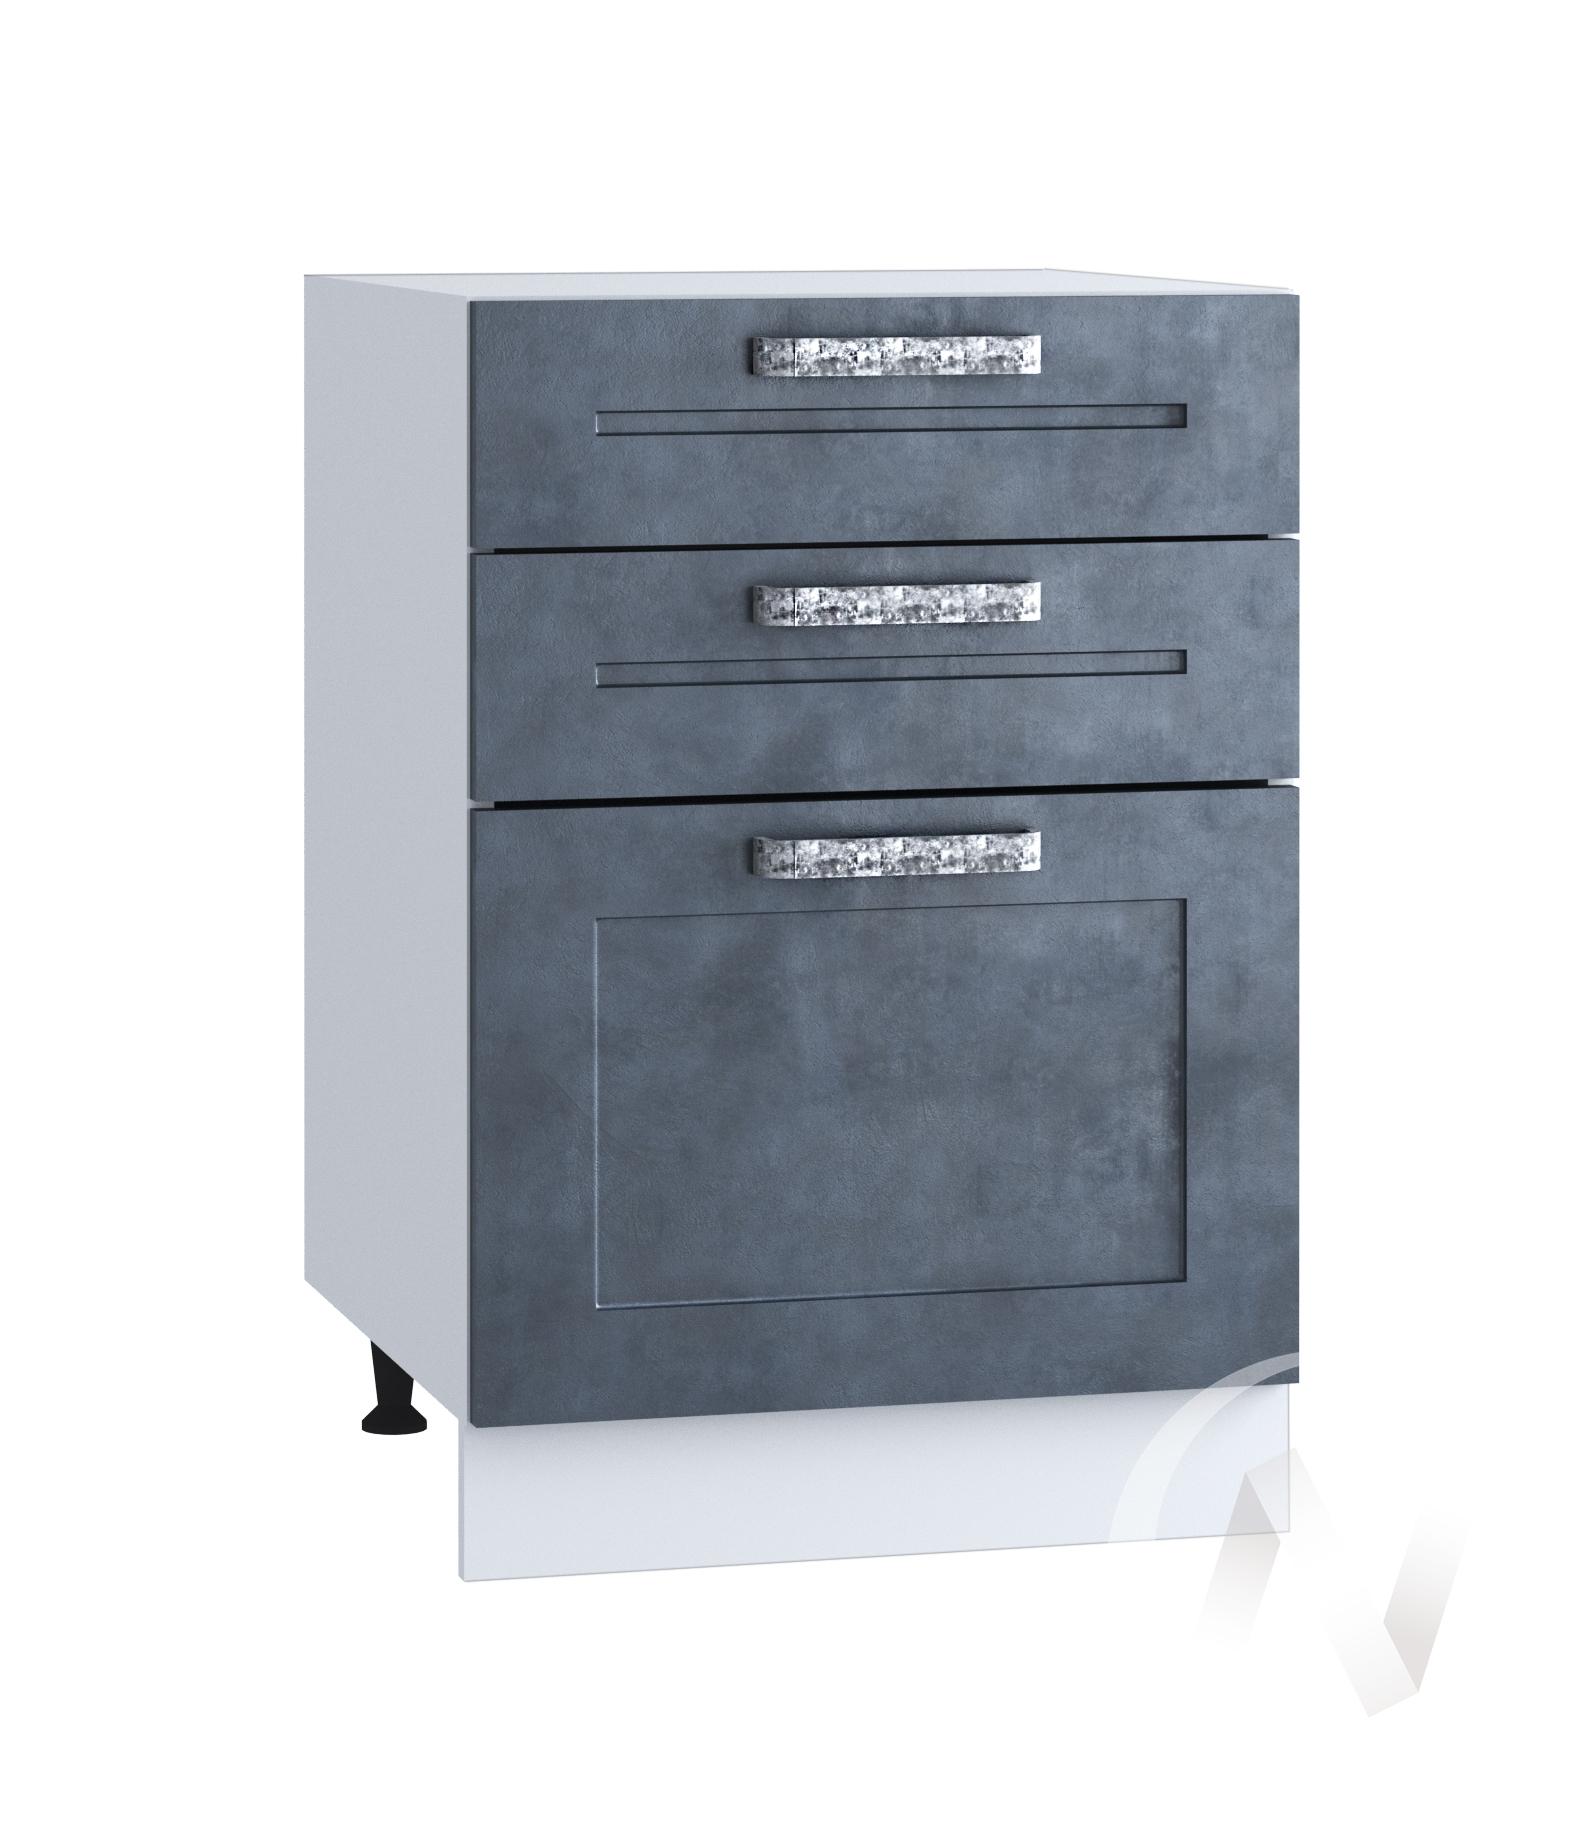 "Кухня ""Лофт"": Шкаф нижний с 3-мя ящиками 500, ШН3Я 500 (Бетон графит/корпус белый)"